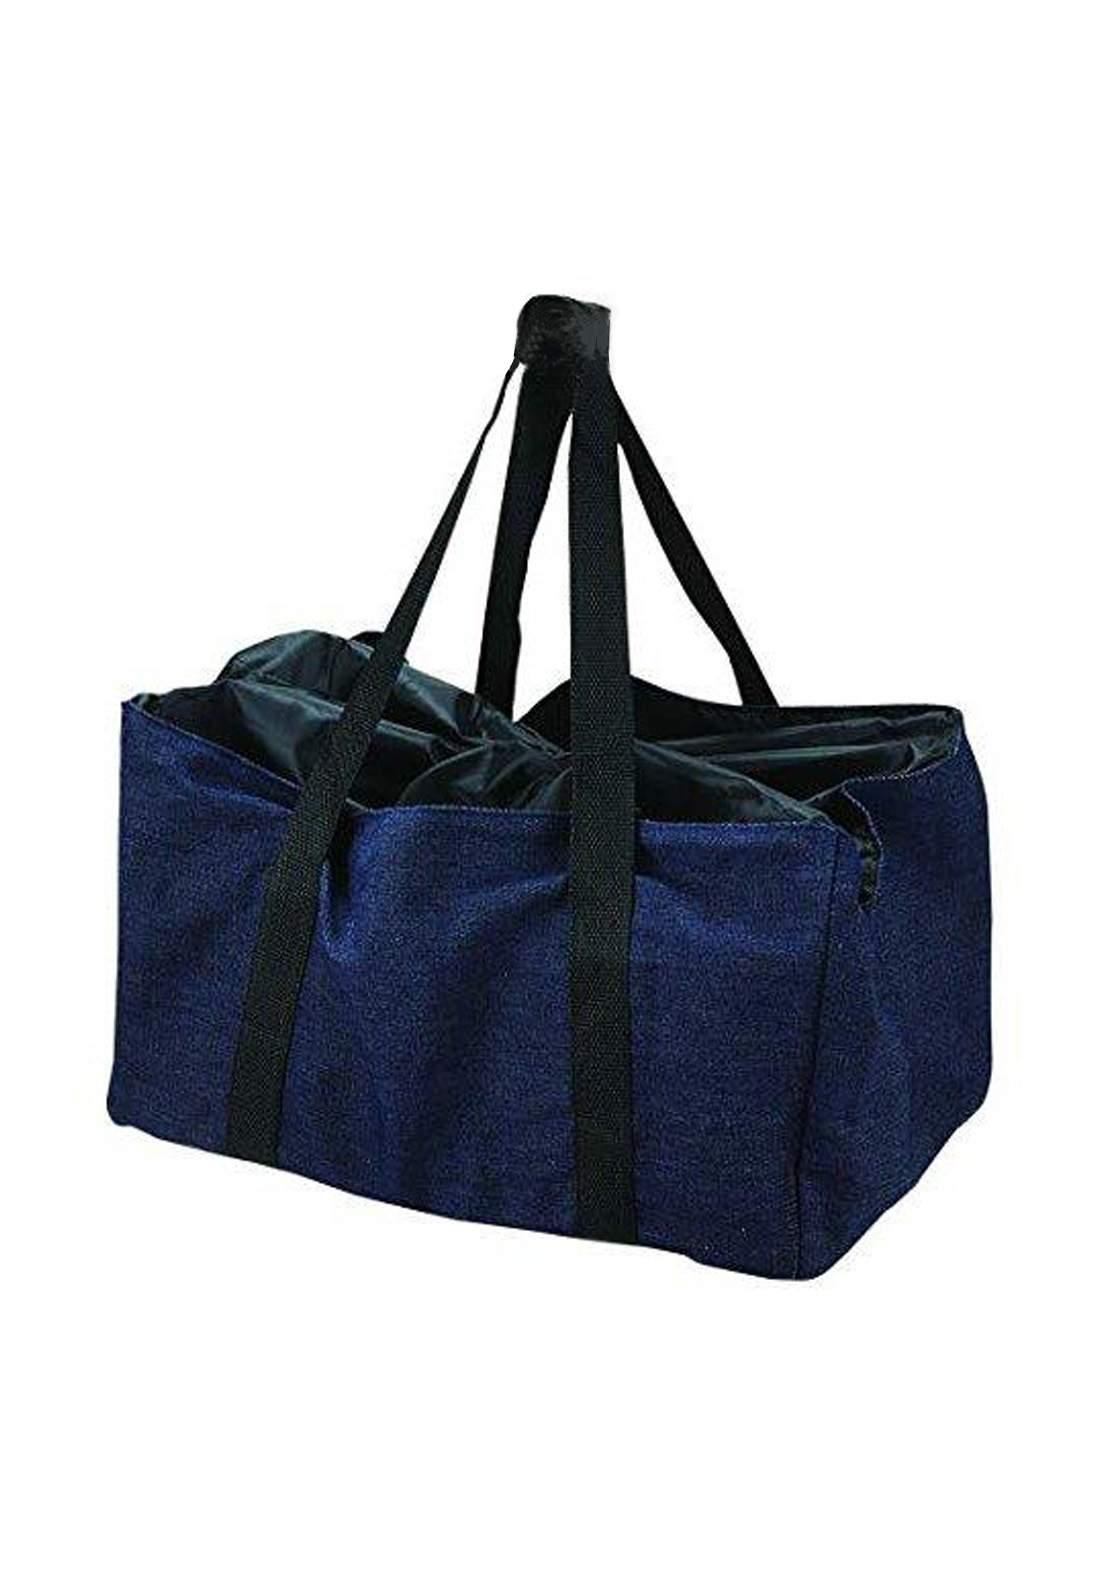 Pearl Metal D-6502 Marquee Regicago Bag Denim حقيبة متعددة الأستخدام